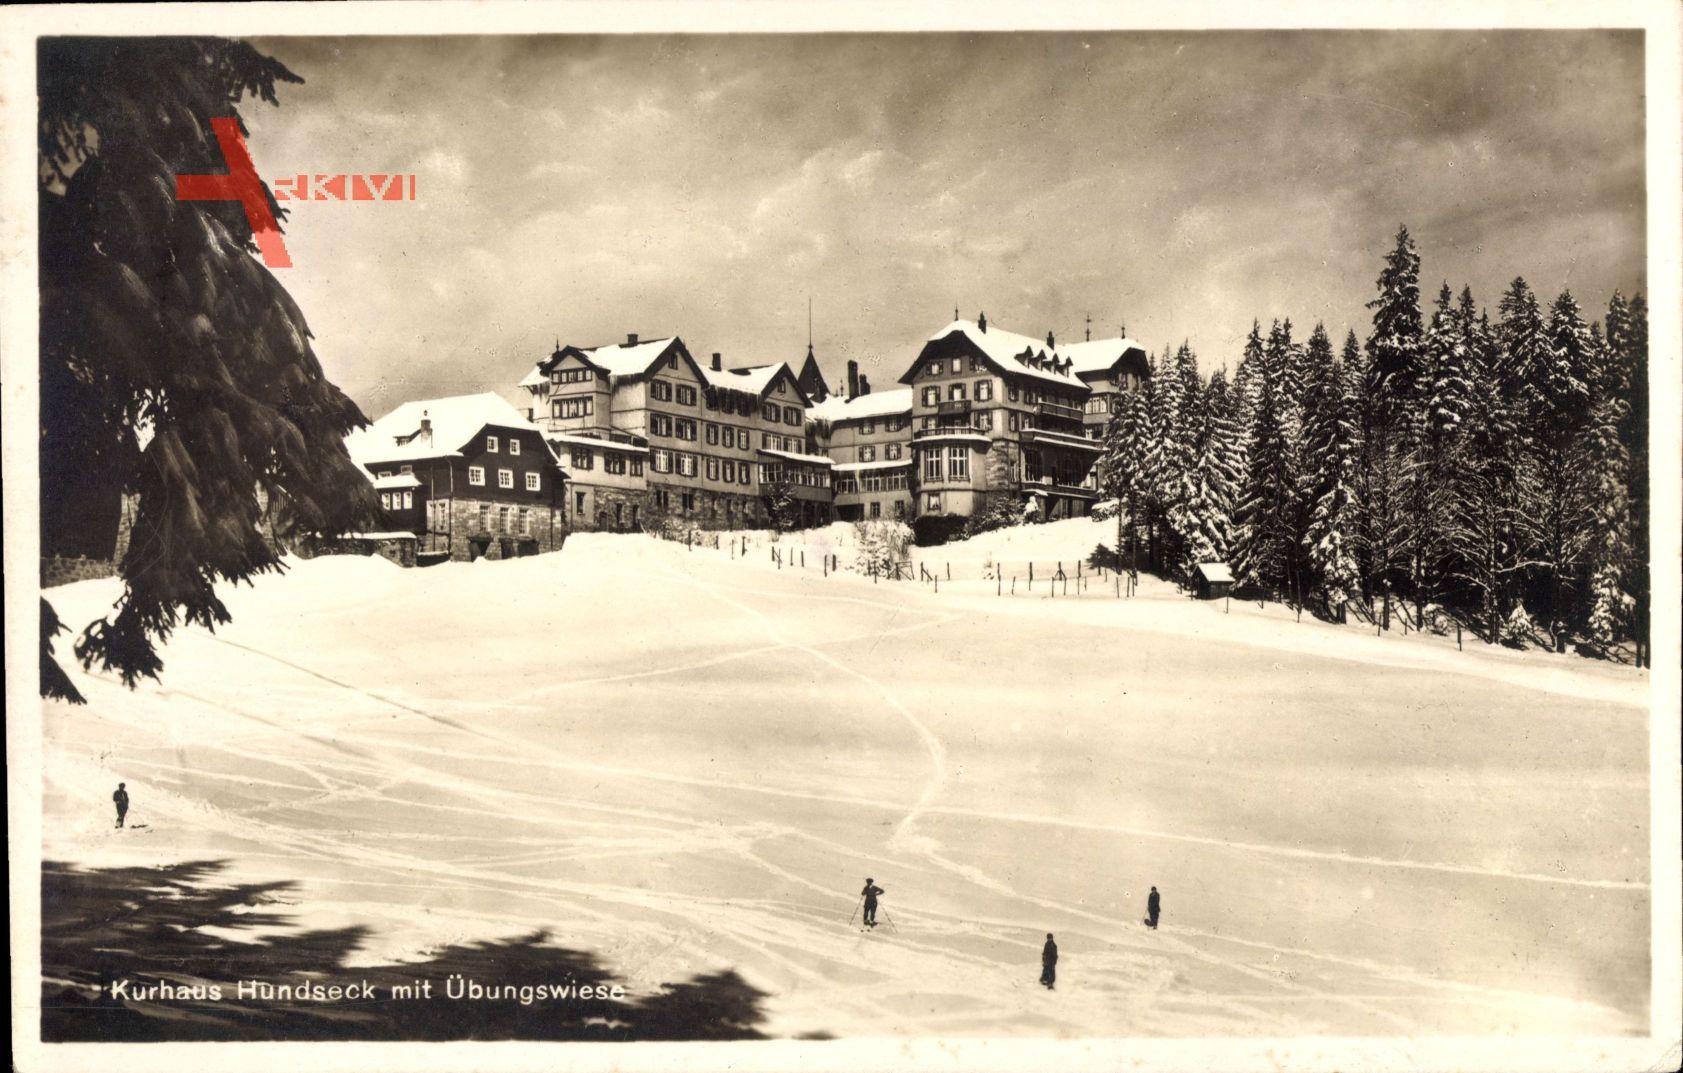 Hundseck Ottersweier, Blick aufs Kurhaus mit Übungswiese, Wintersport,Schnee